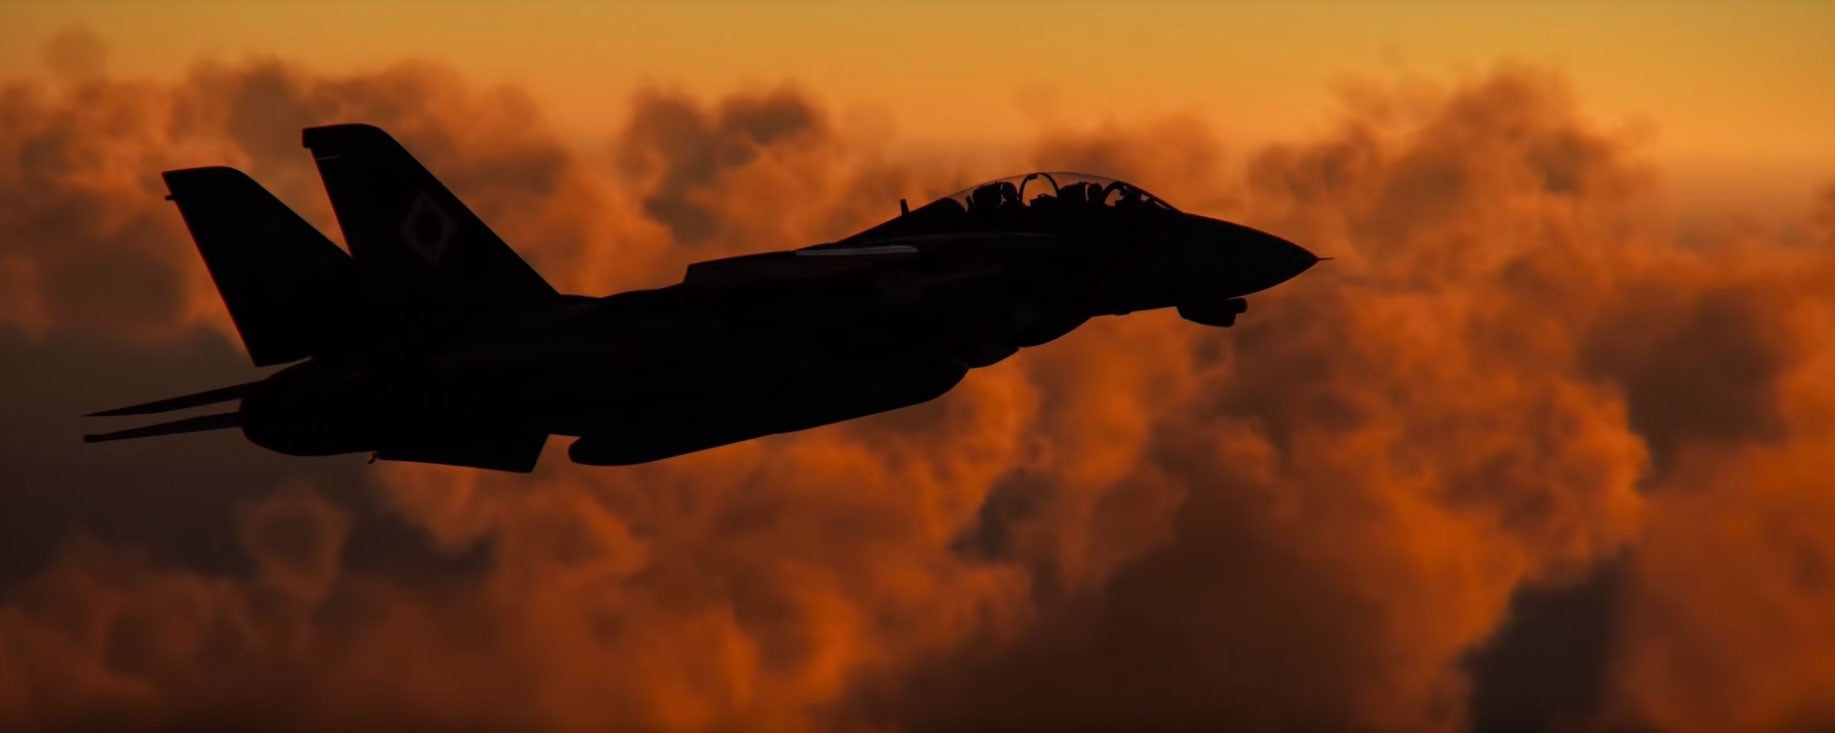 F-14 Flight Sim Does A Perfect Top Gun Impression